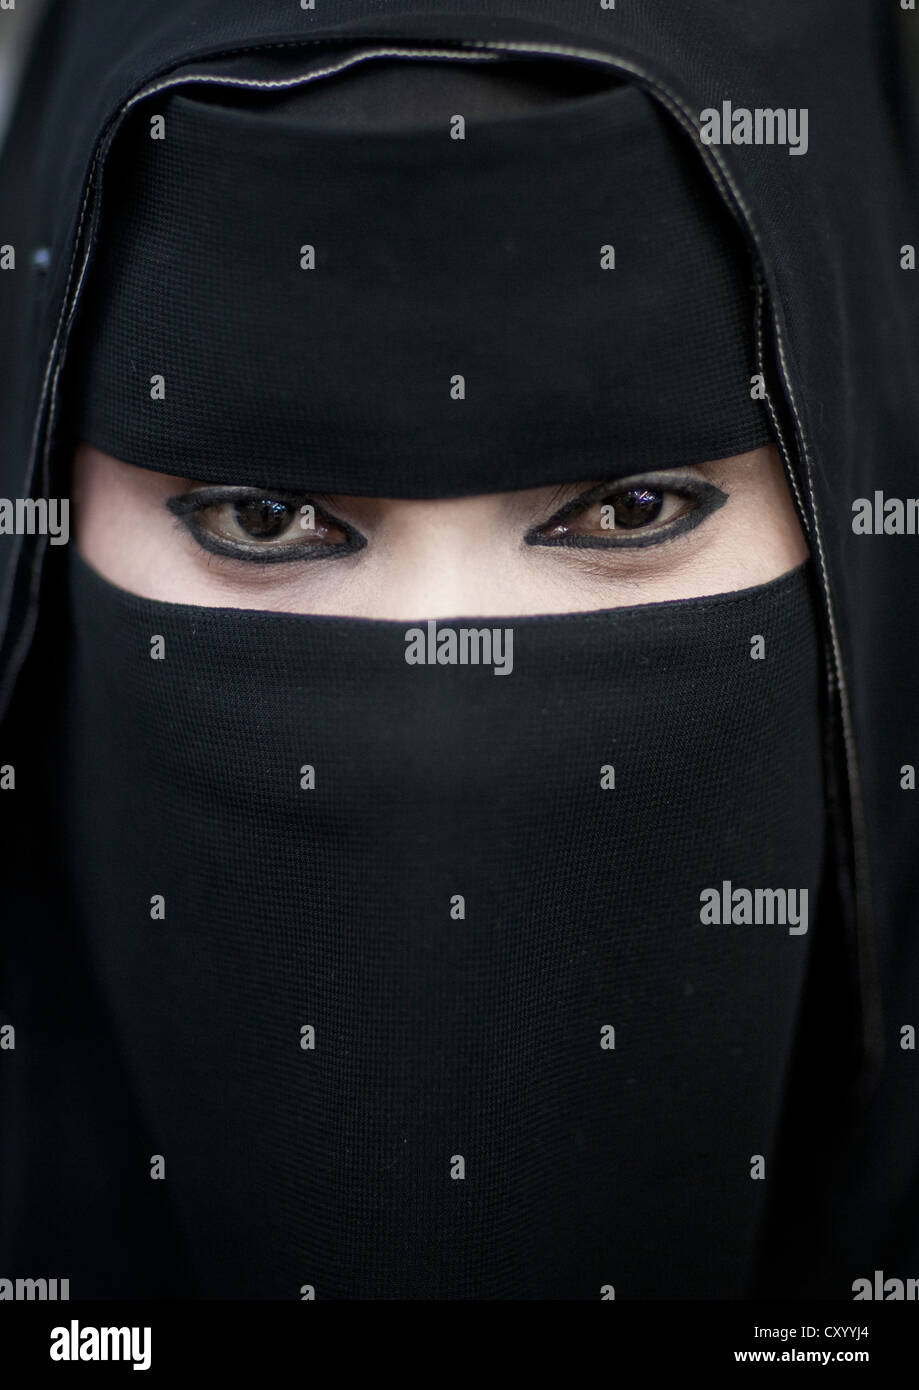 Dating salalah female Salalah Dating